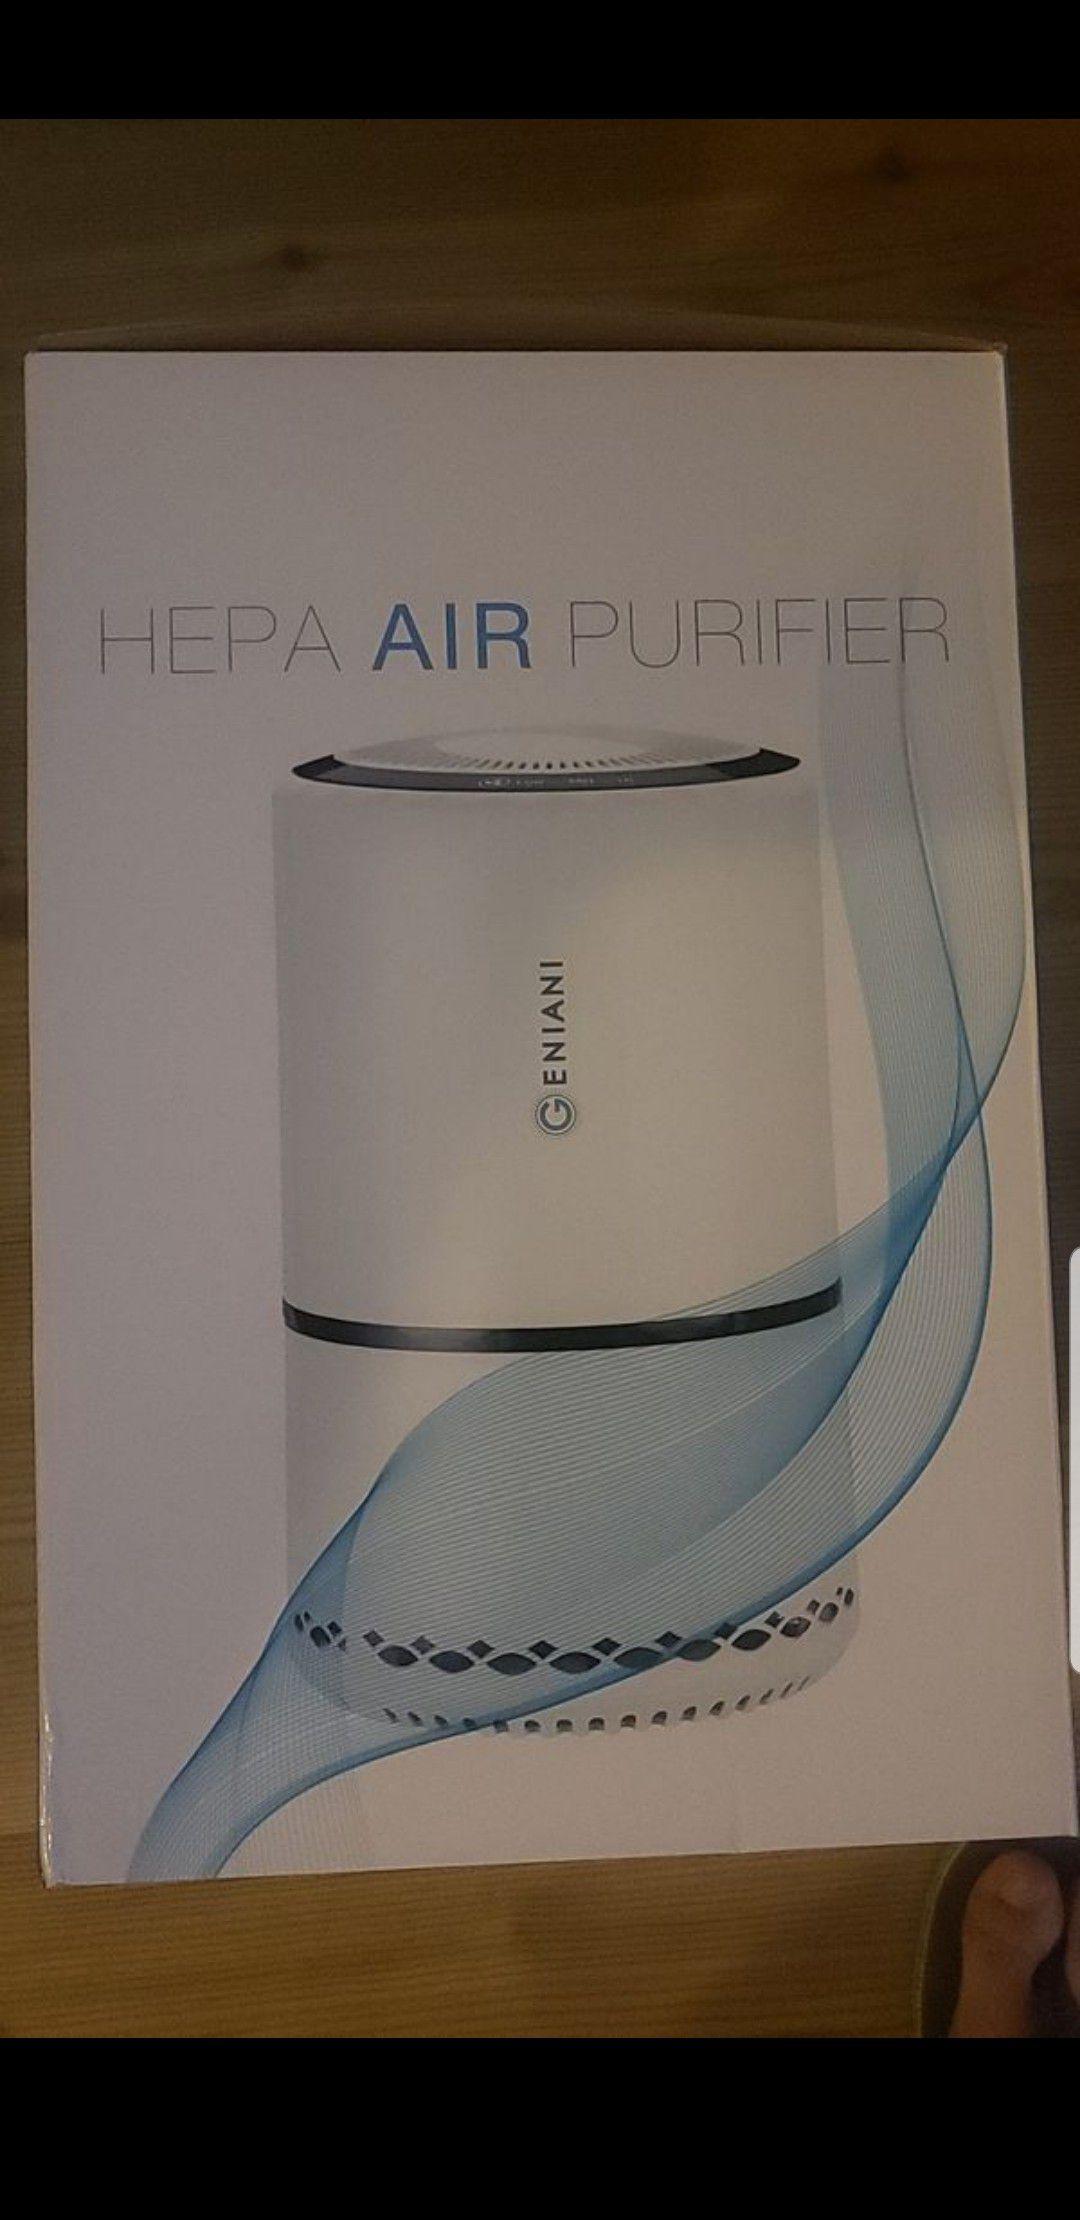 Air purifier with advanced air filter